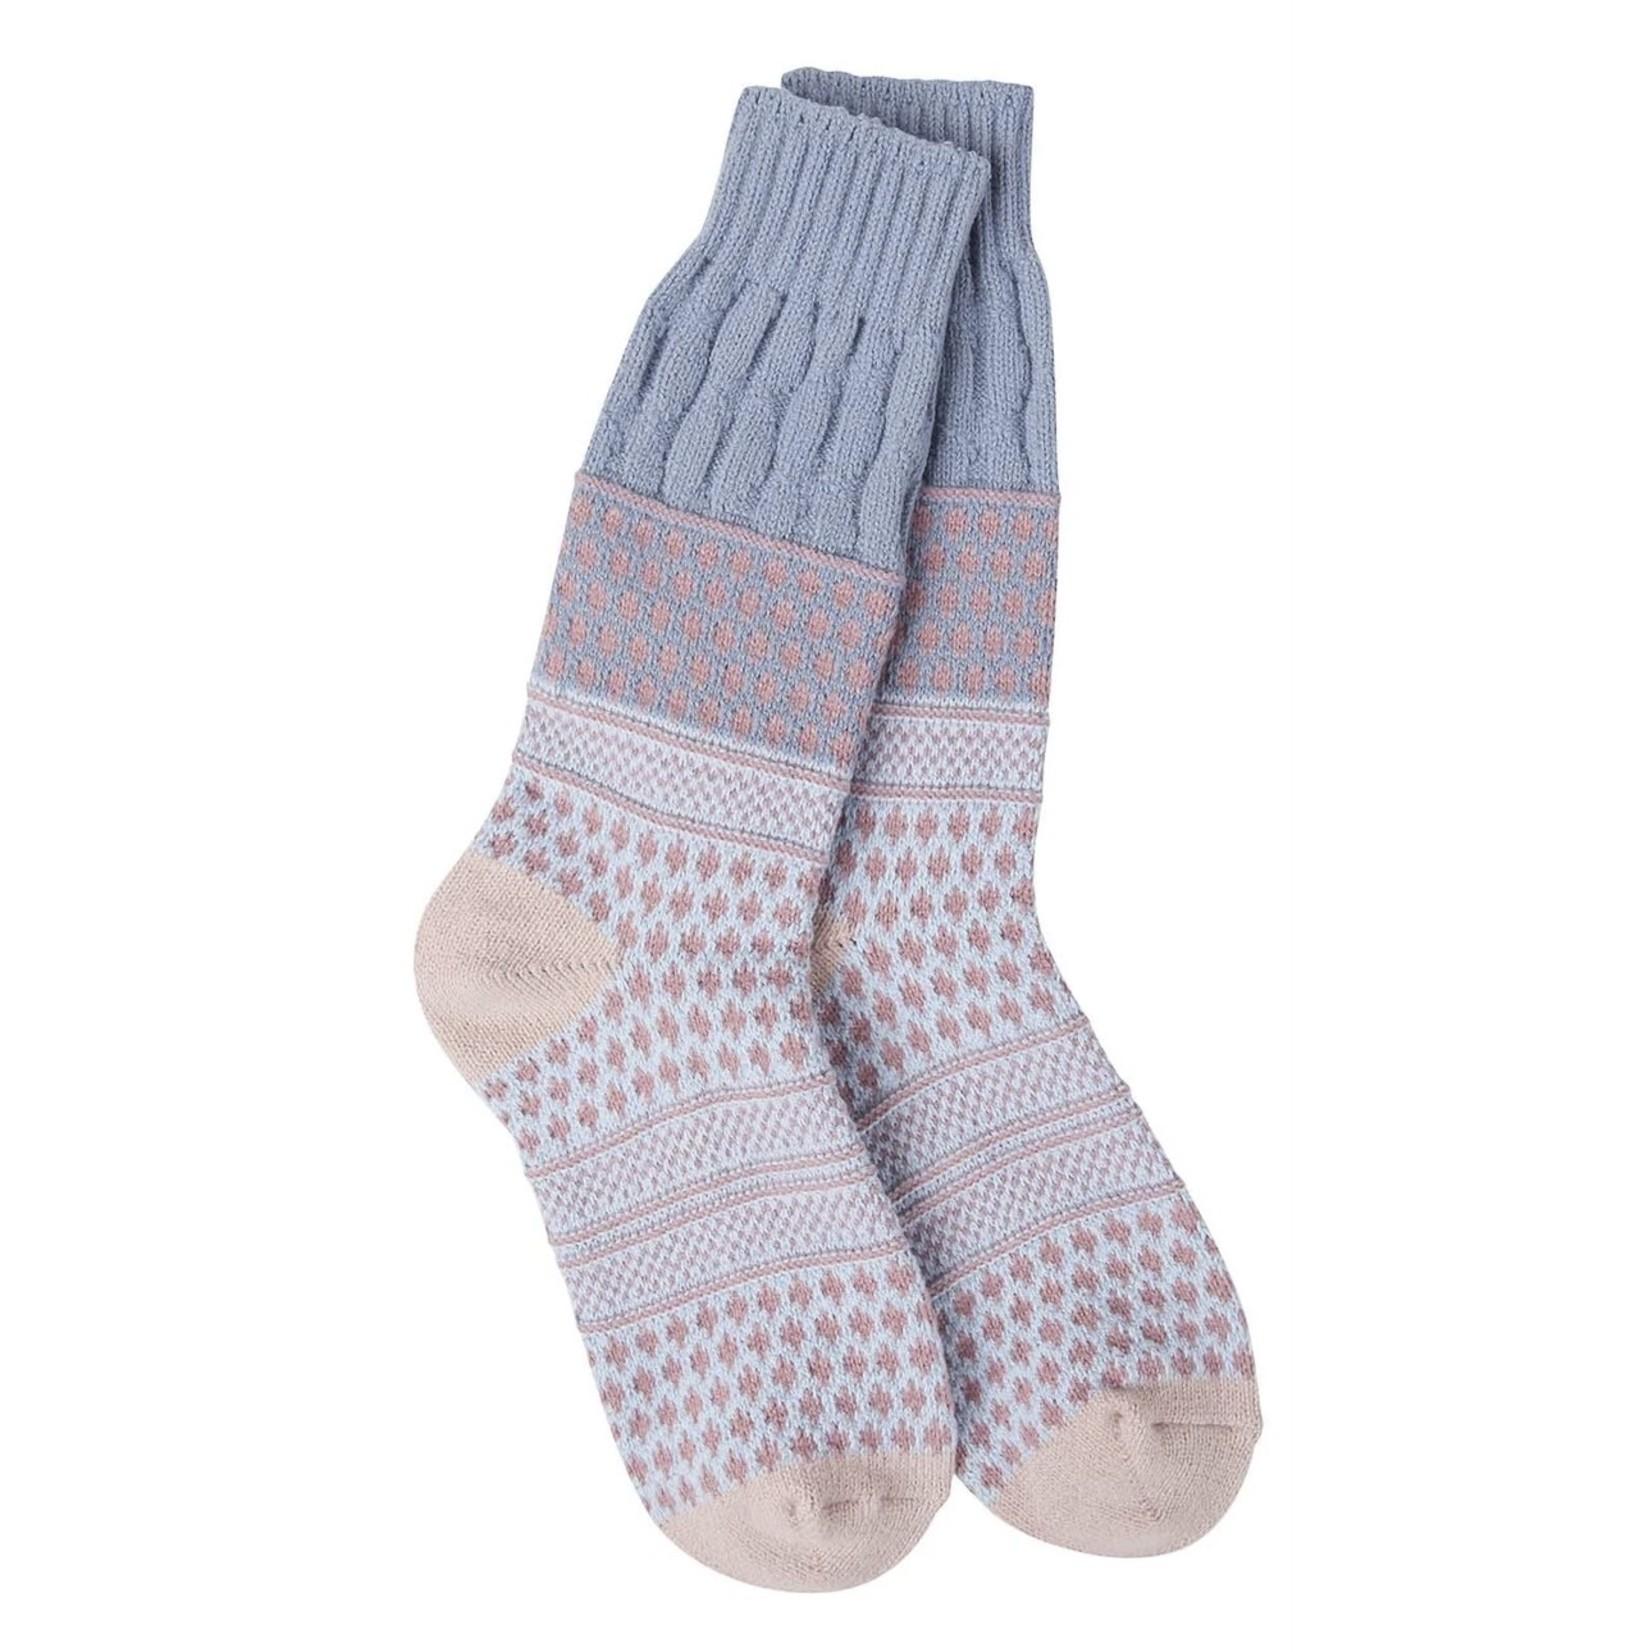 Crescent Sock Company Sock: Gallery Crew: Rachael